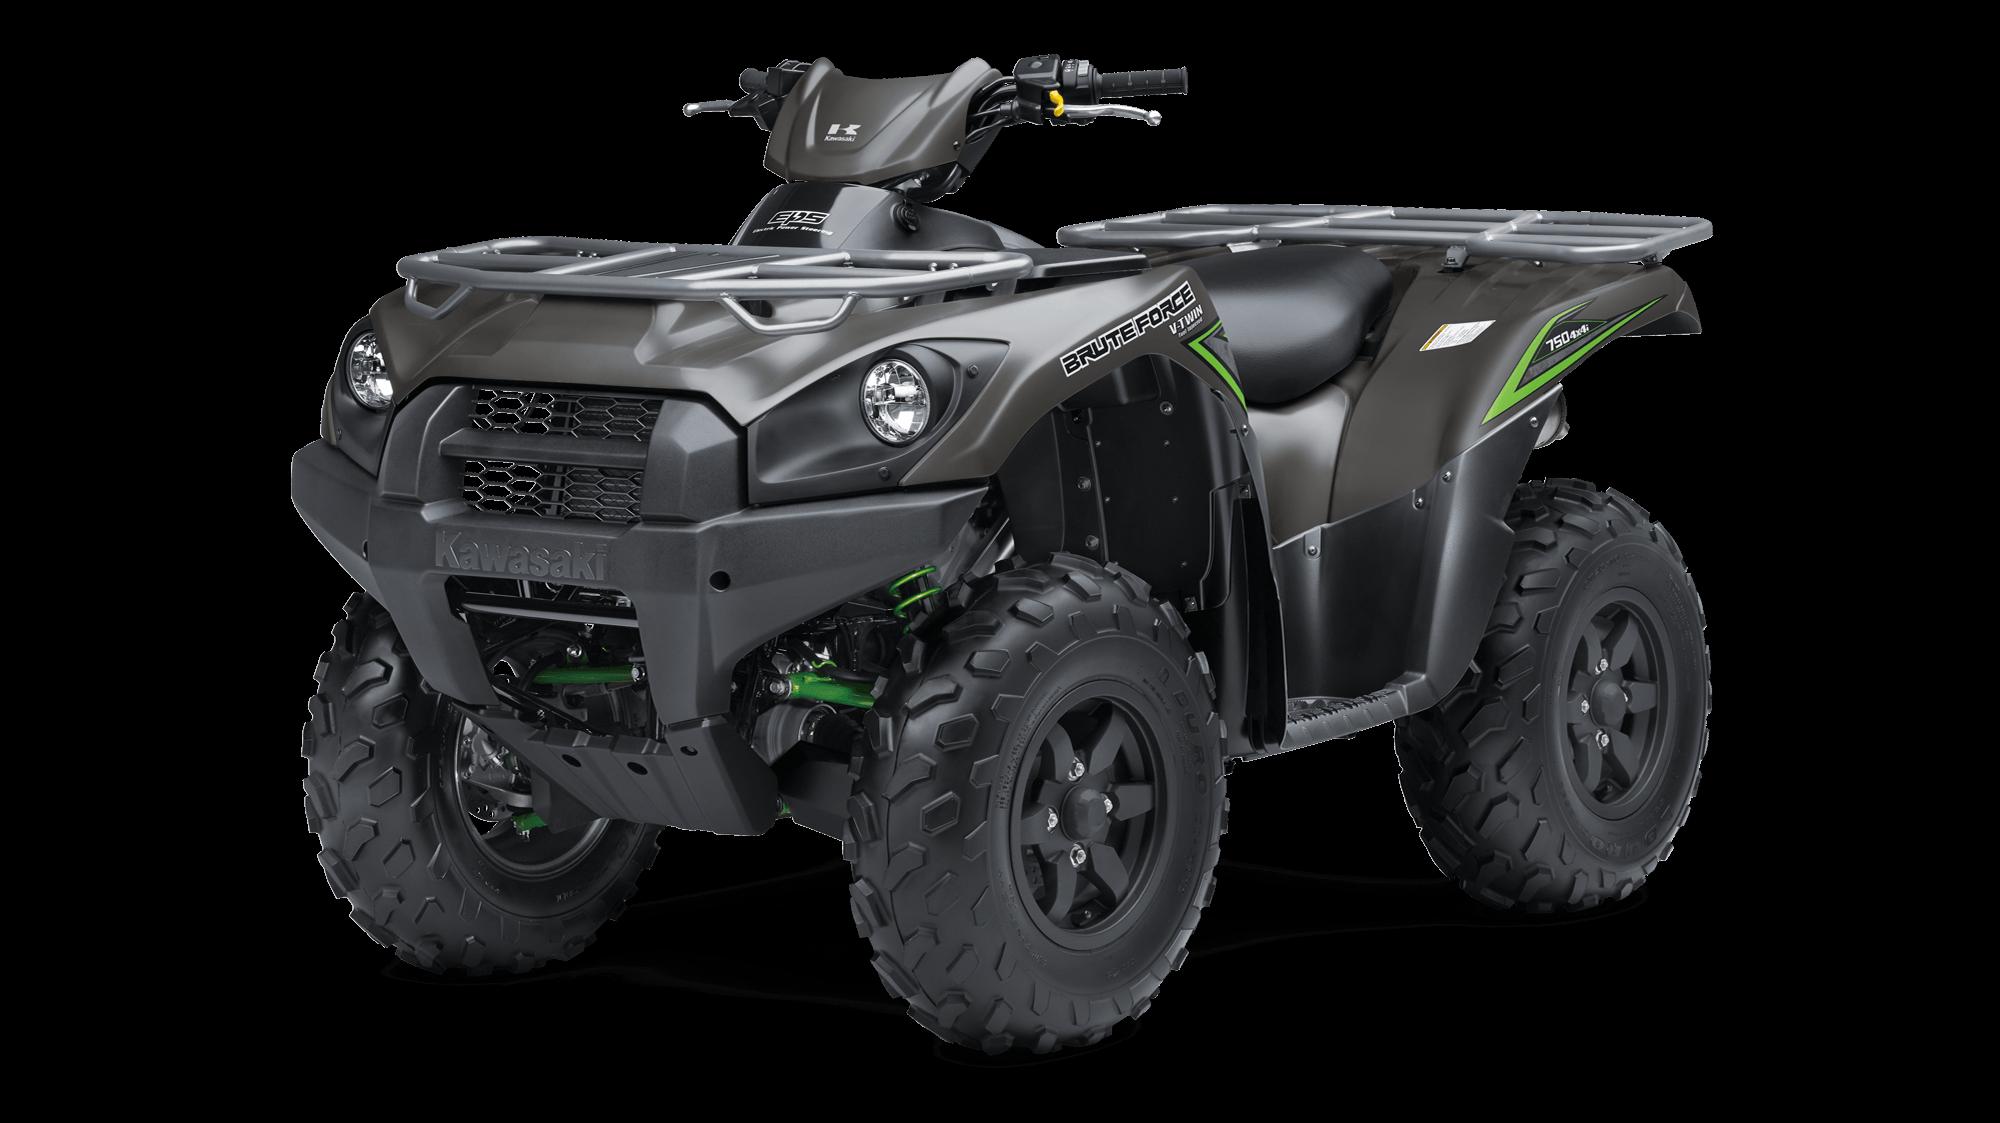 2017 BRUTE FORCE® 750 4x4i EPS Sport Utility ATV by Kawasaki | Get